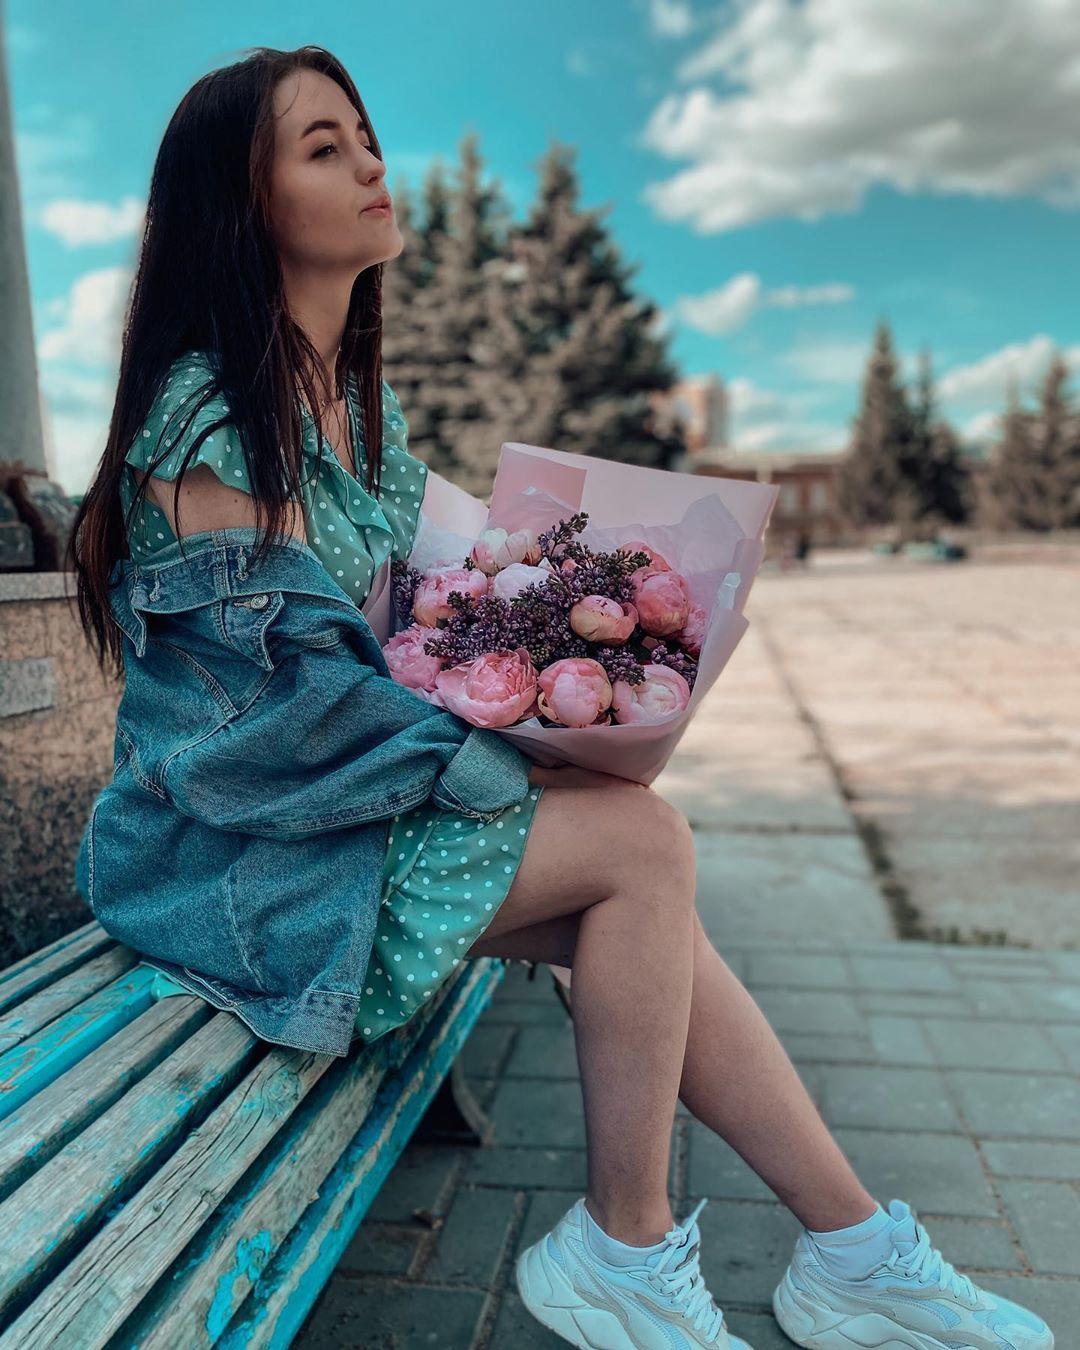 Публикация с тегами: Обои, Интересное, Мода и красота, Девушка